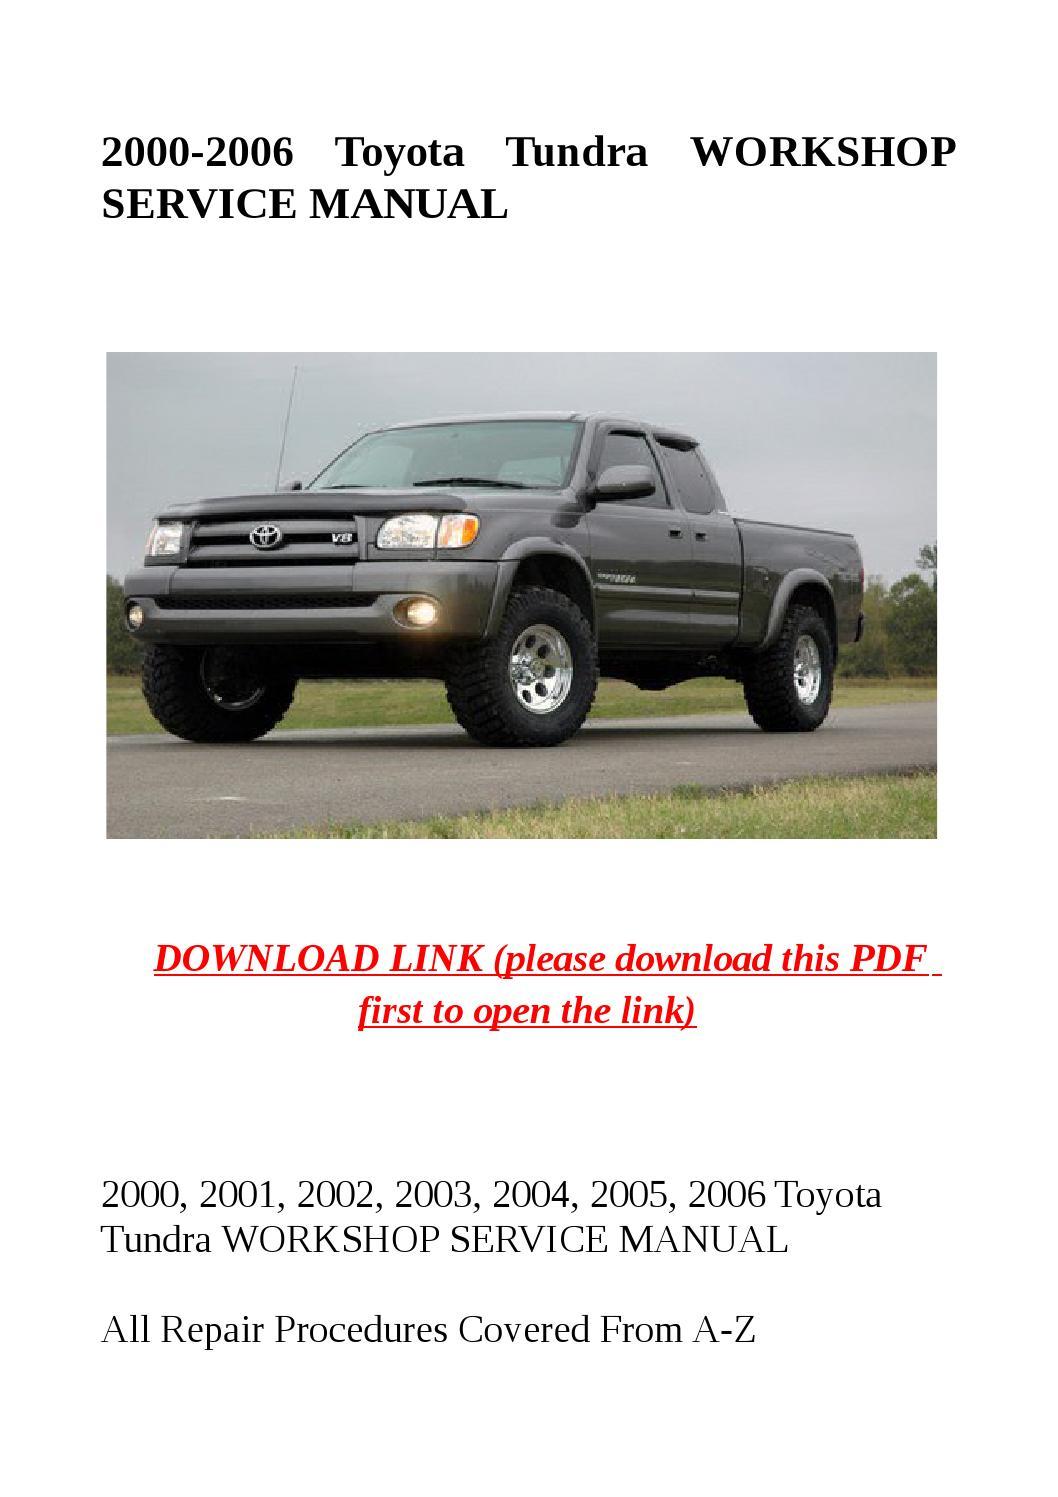 2000 2006 toyota tundra workshop service manual by herrg issuu